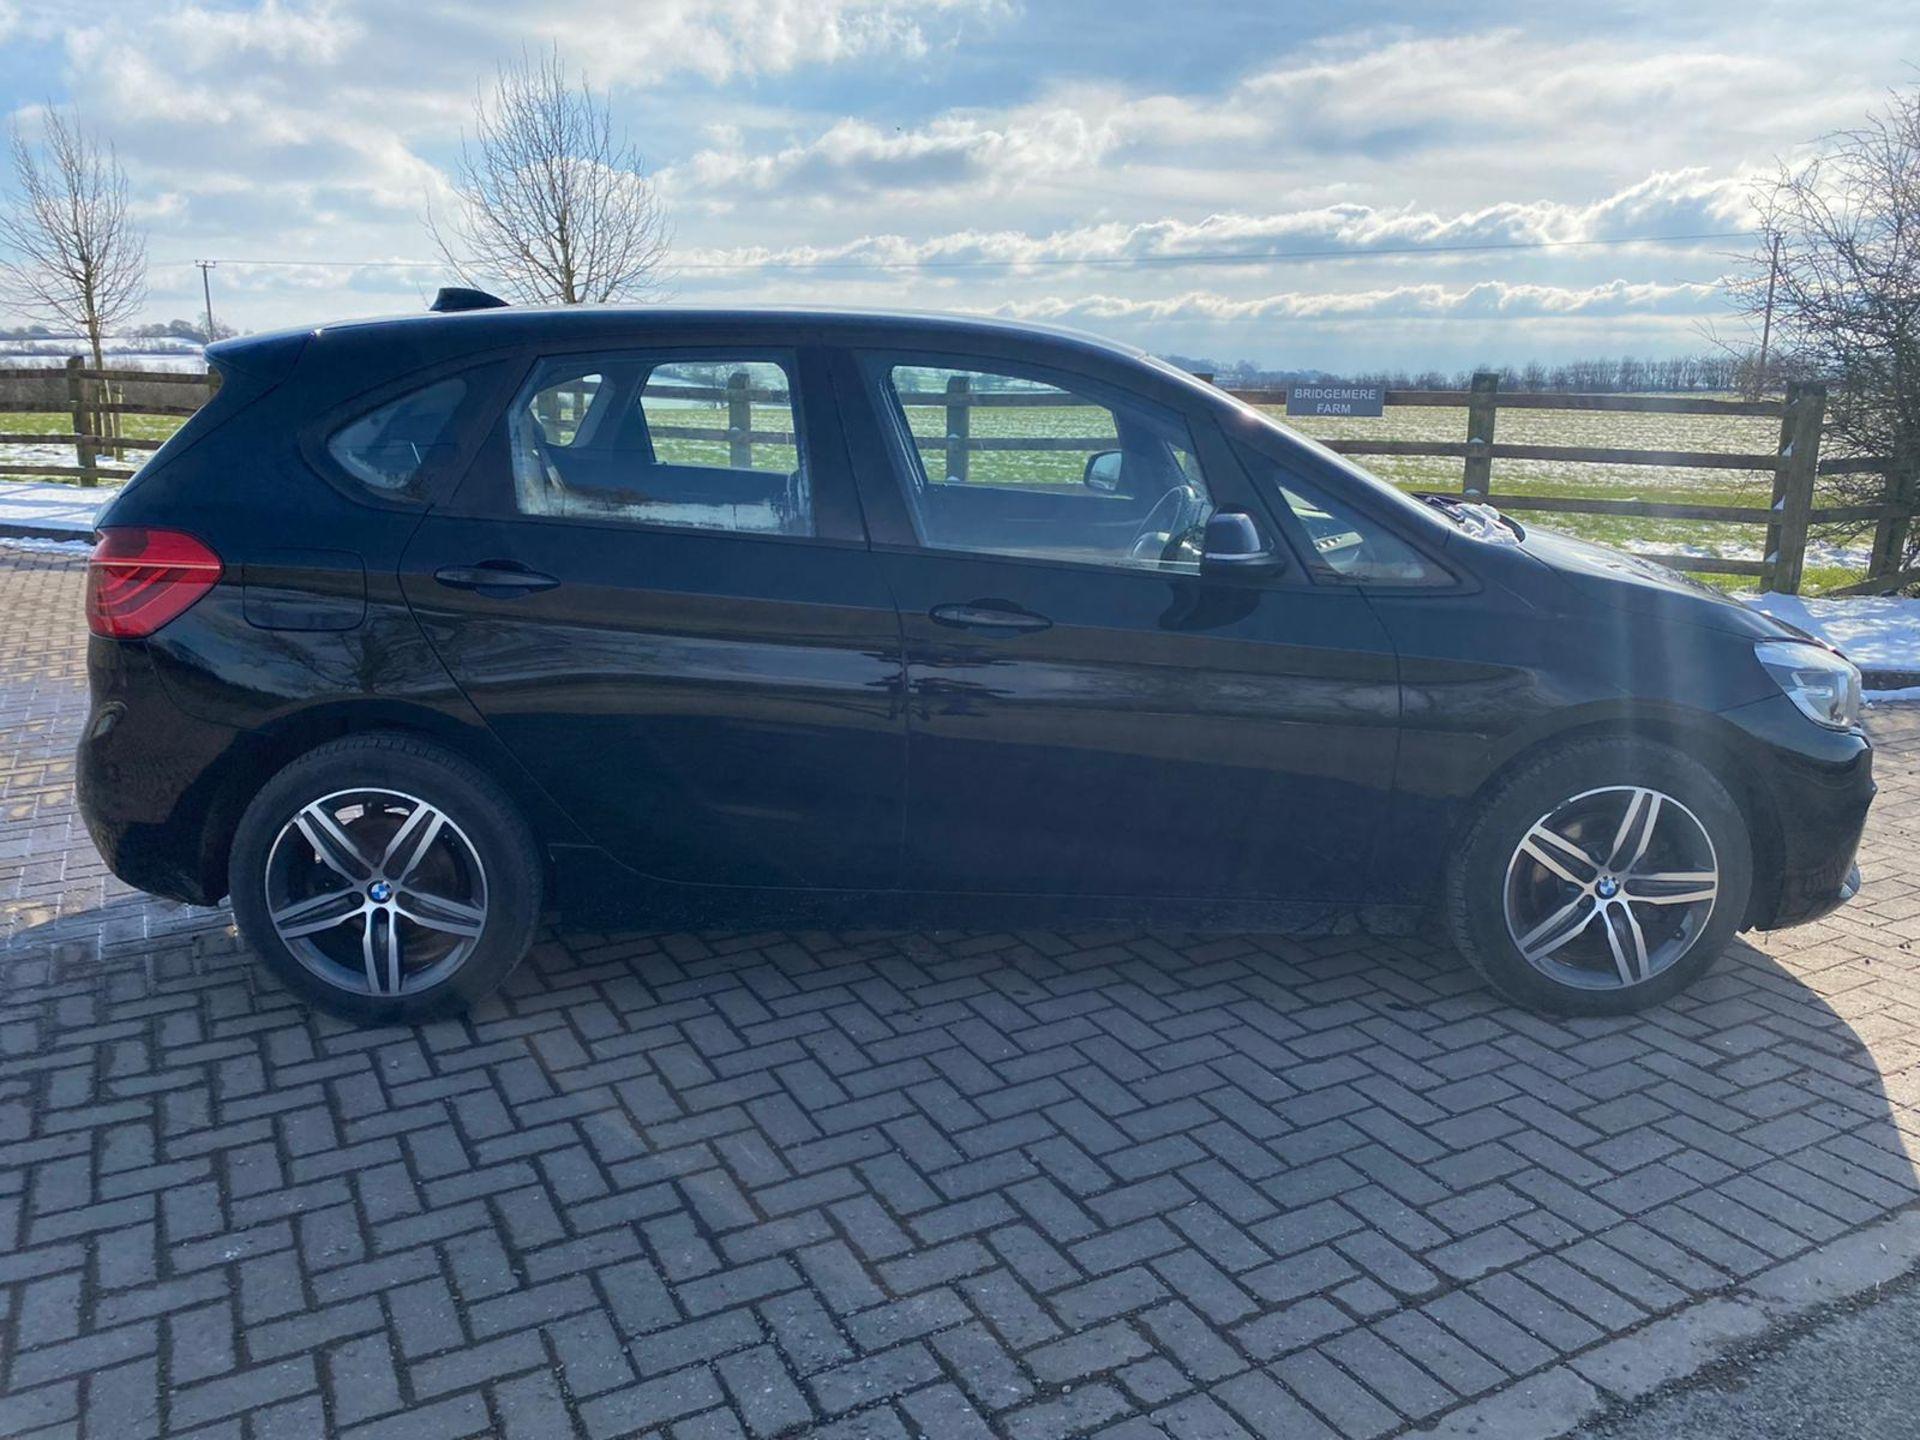 "ON SALE BMW 218d ""SPORT"" MPV 2.0 DIESEL ""EURO 6"" (2016 REG) - 1 OWNER - GREAT SPEC - BLACK - LOOK!! - Image 8 of 16"